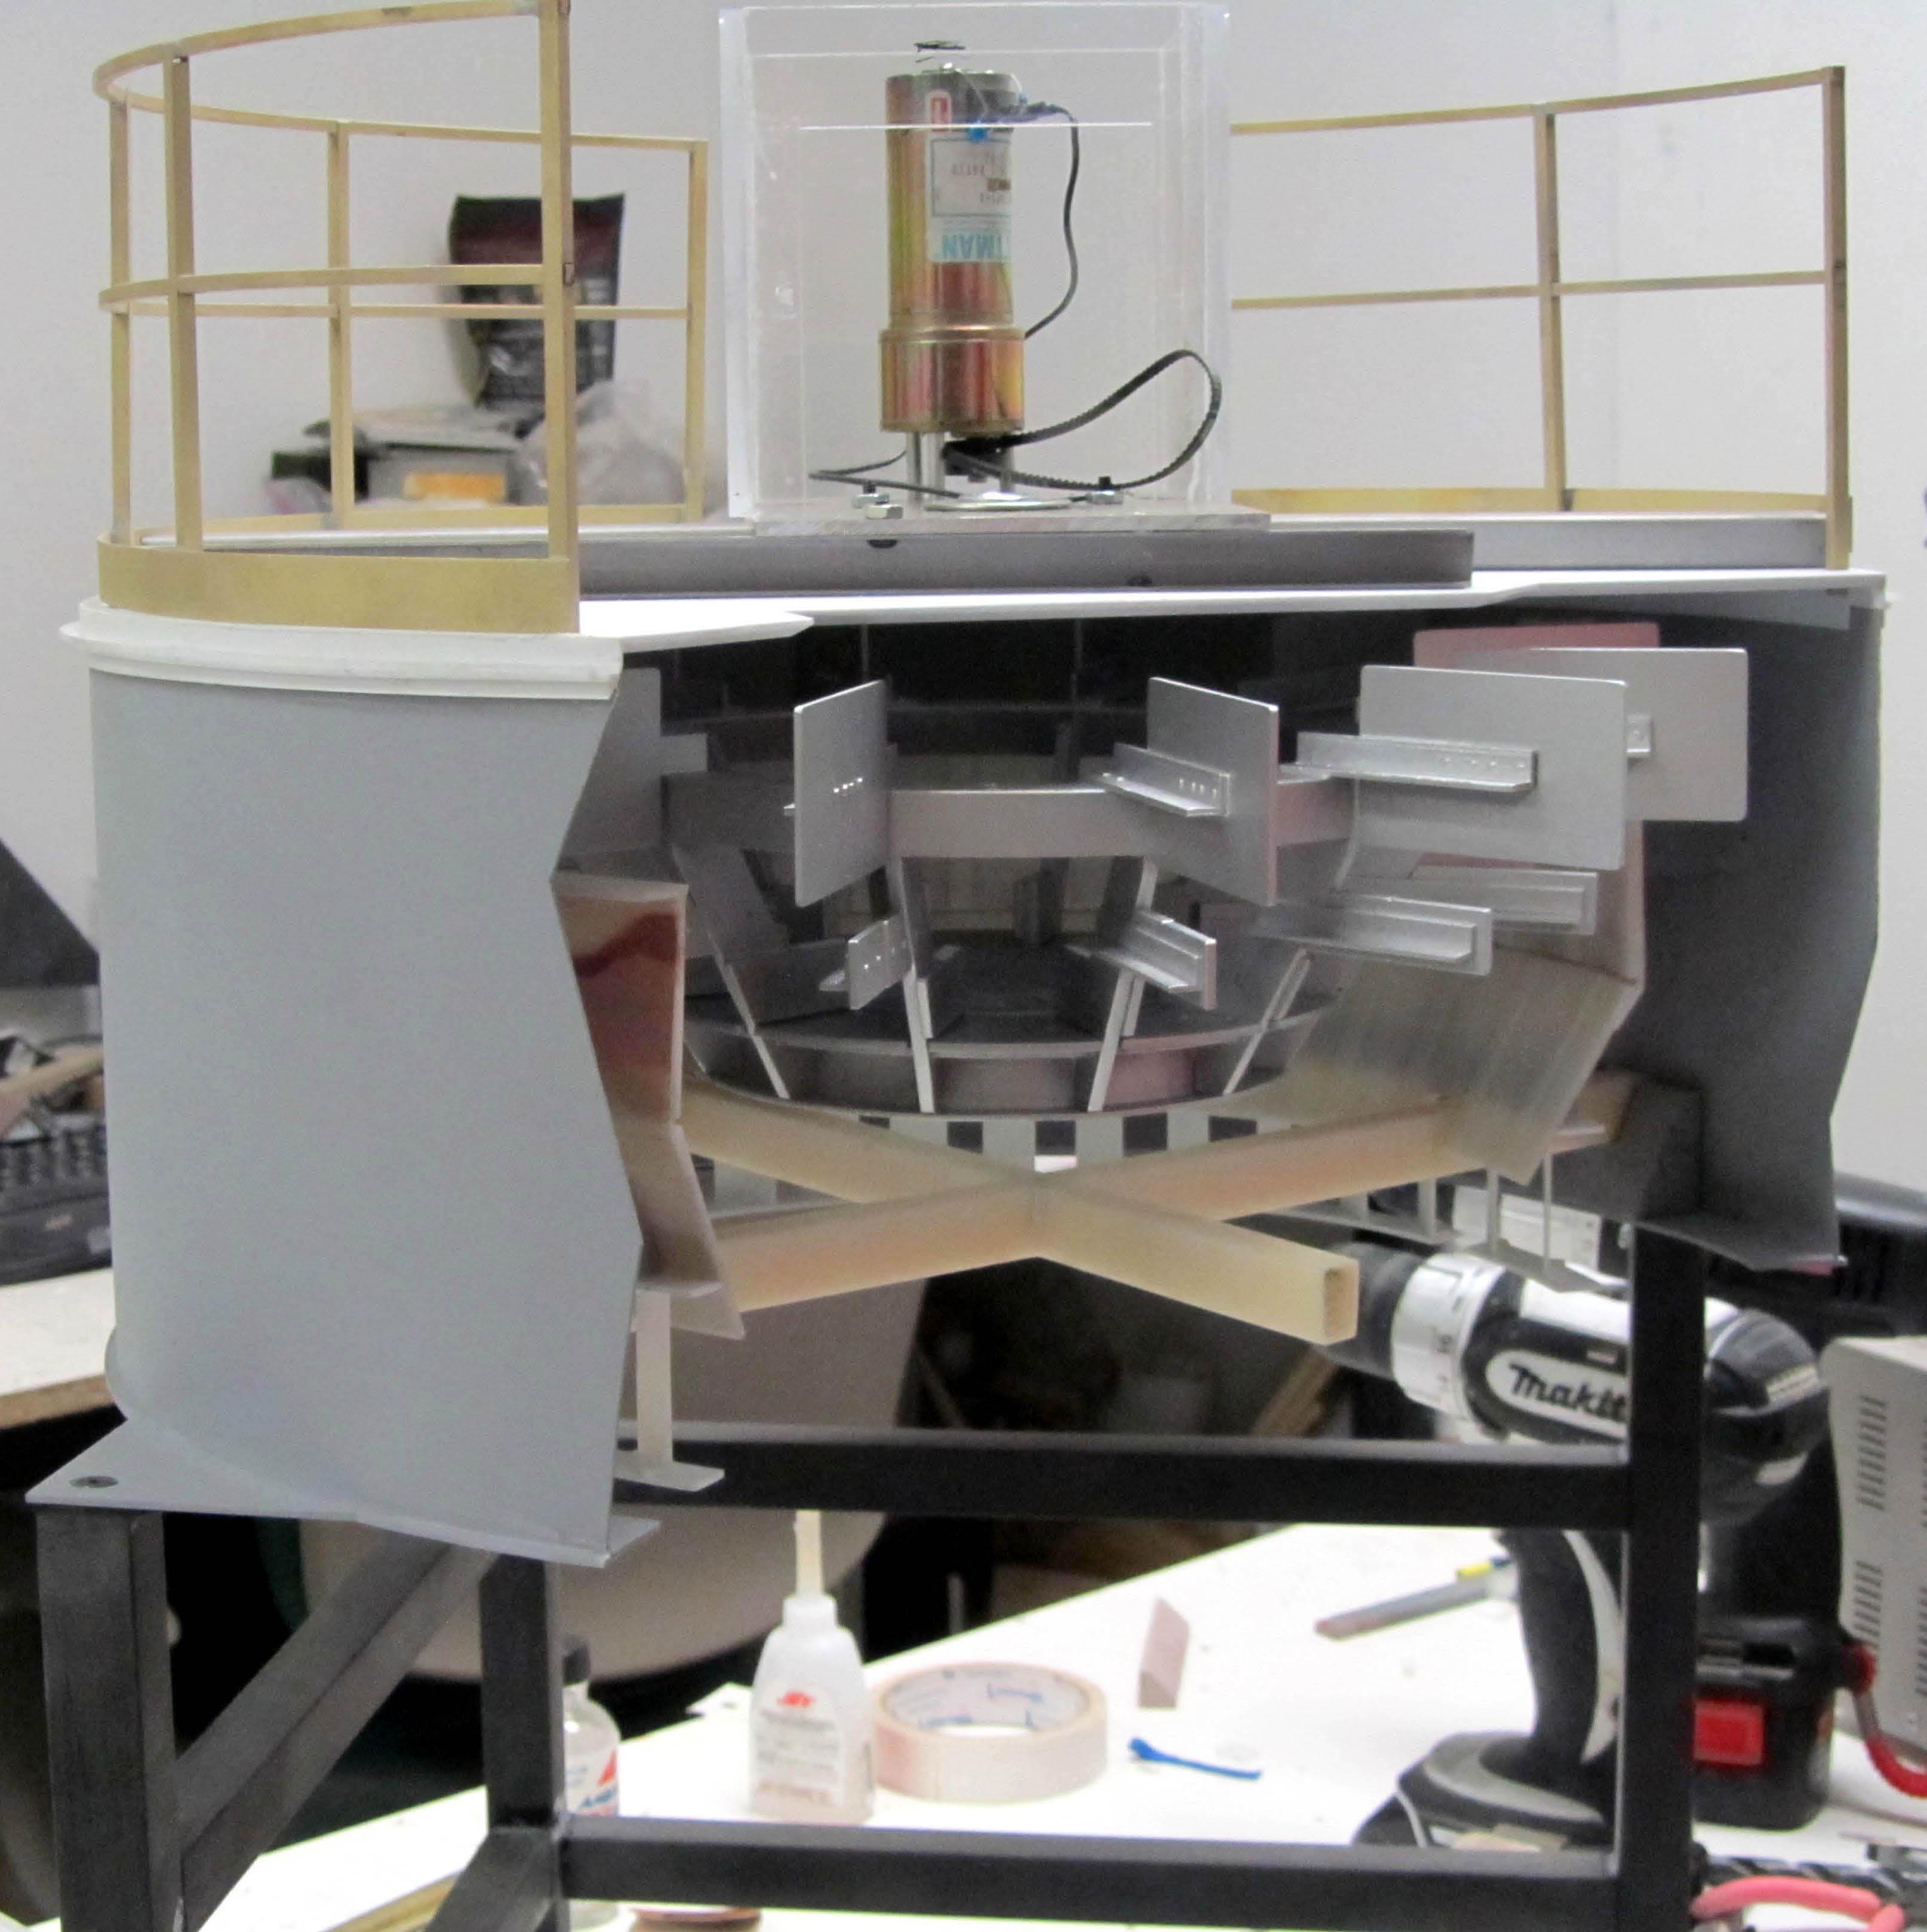 Working Model of Air Separator